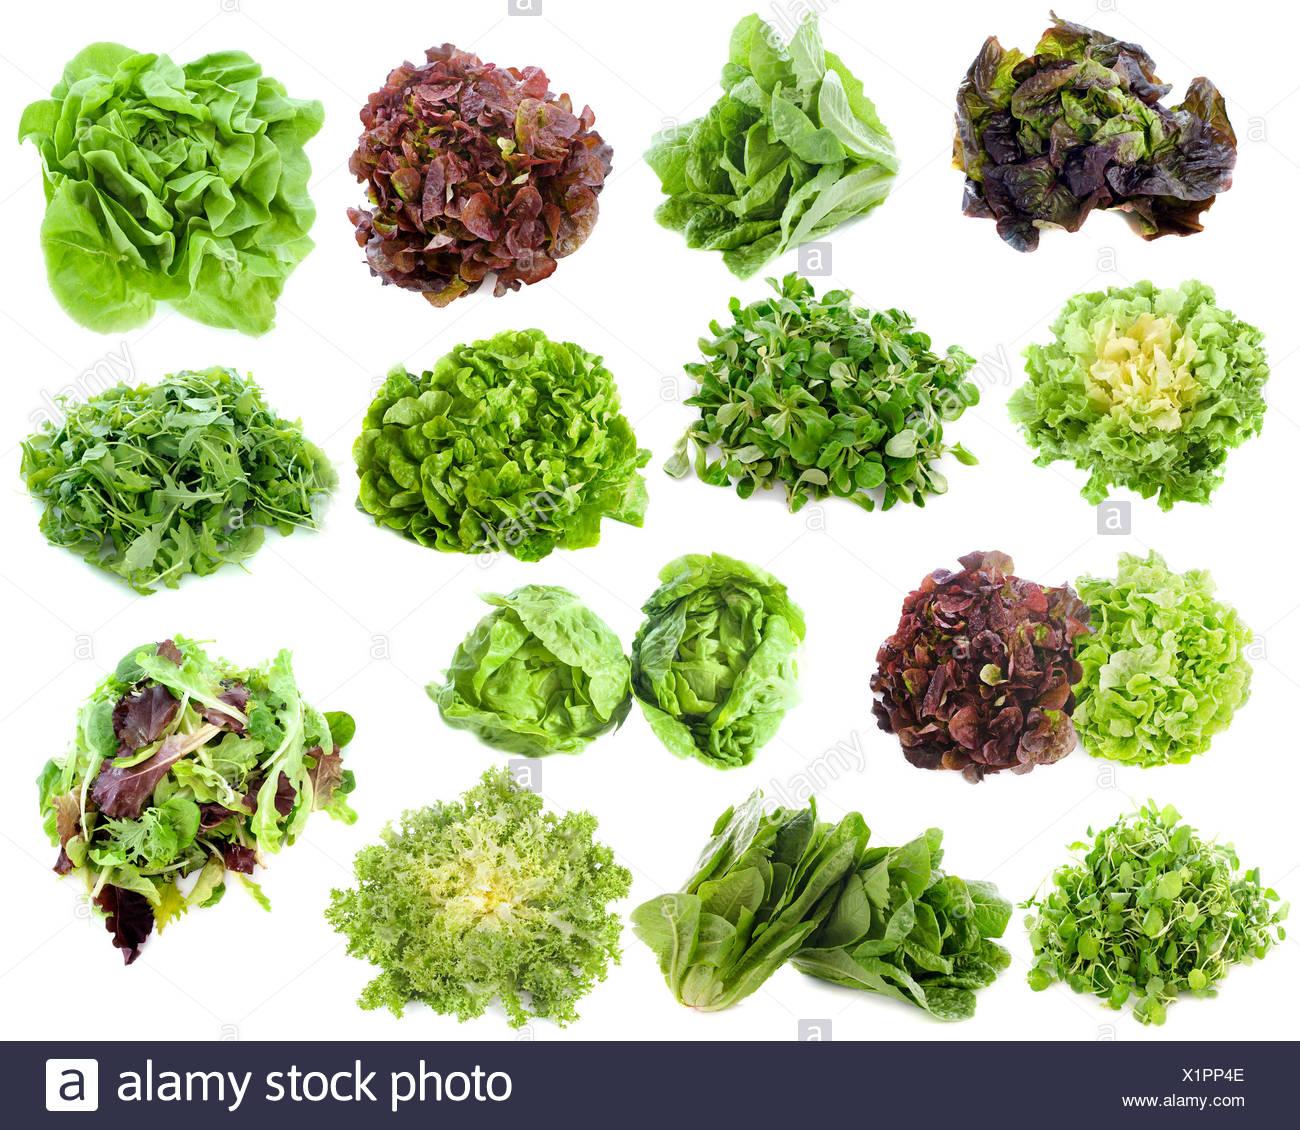 Chicorée Gruppe Endivien Salat Grün Lebensmittel